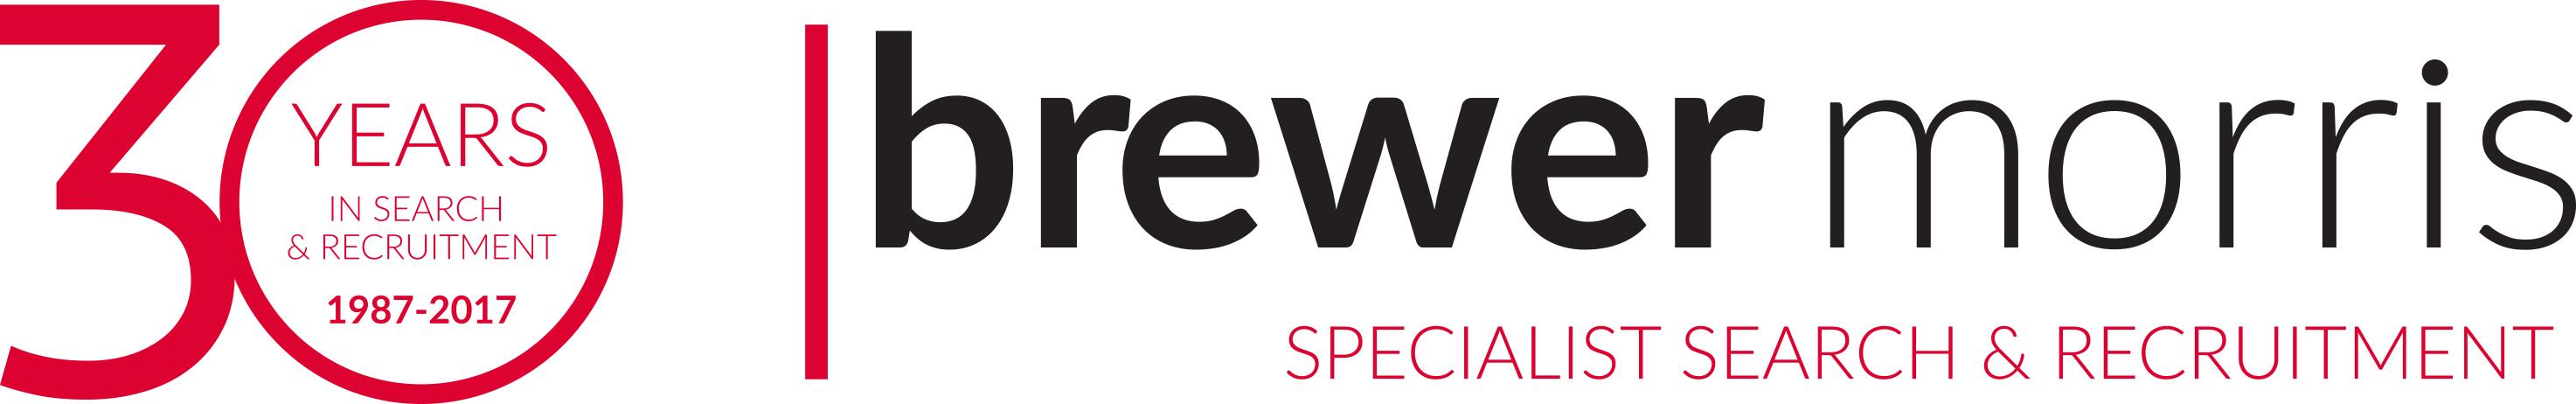 Brewer Morris logo